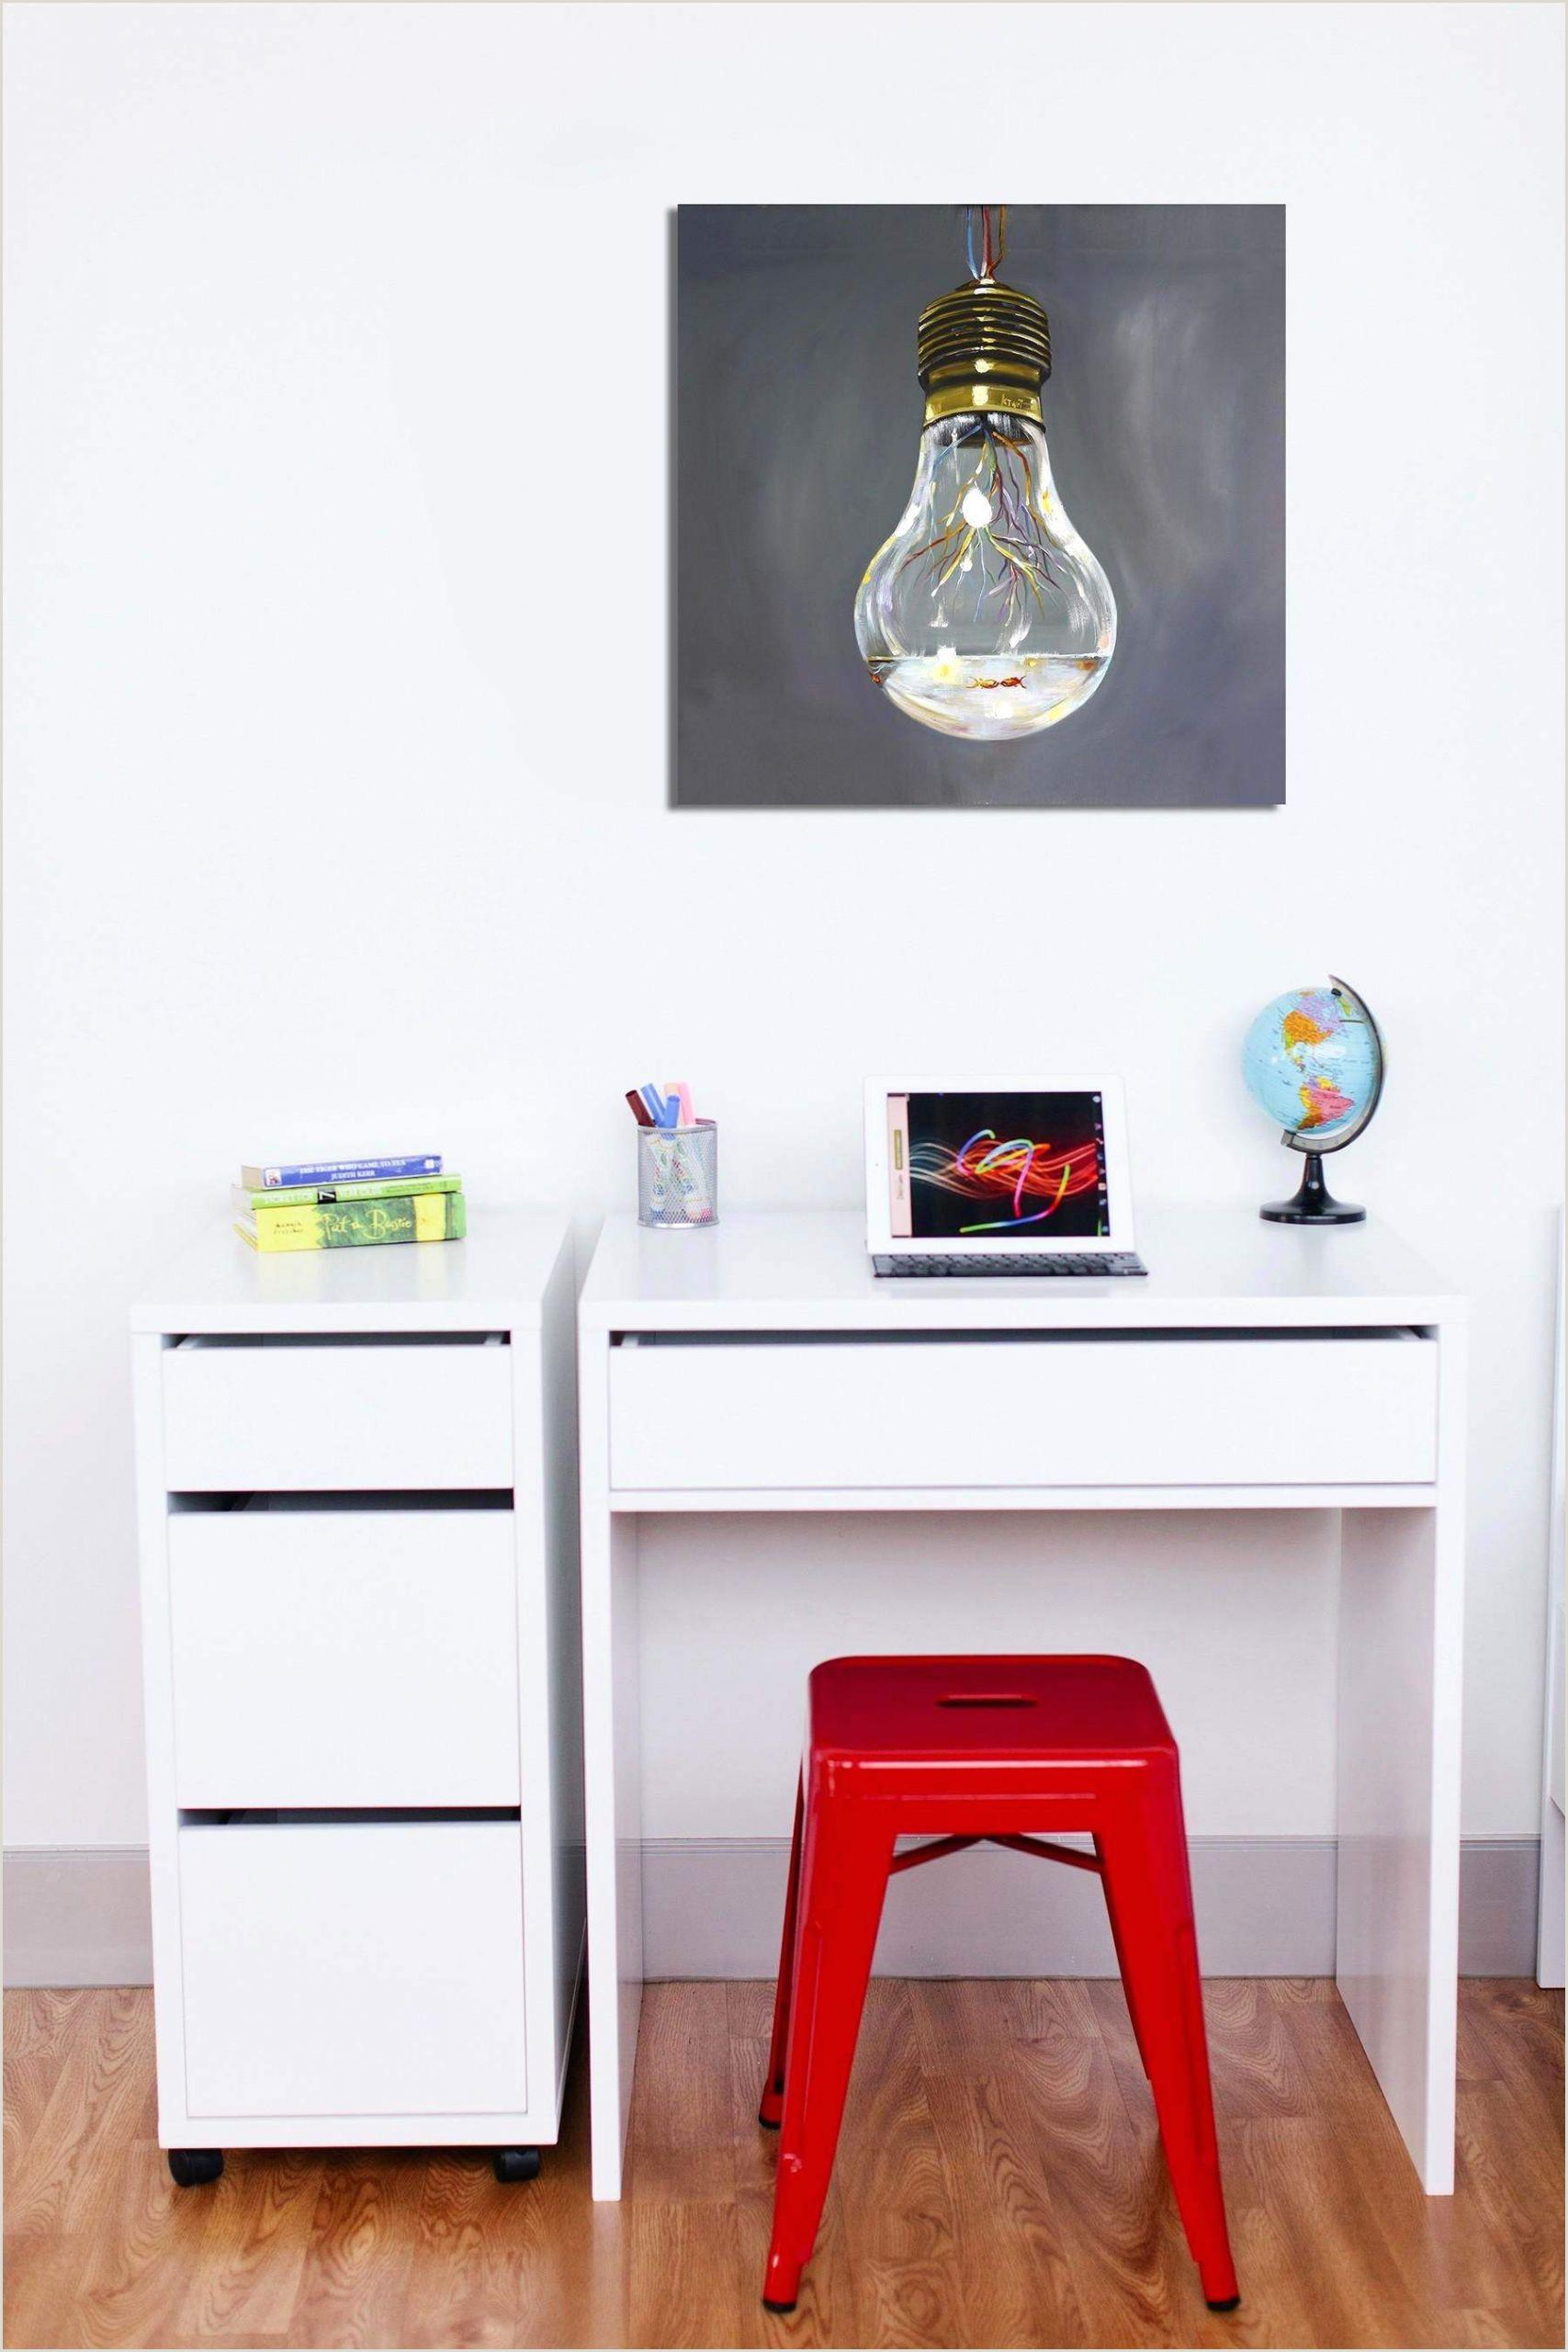 Cheap Picture Stands Wohnzimmer Pc Luxus Couch Tv Einzigartig Gaming Tv Stand